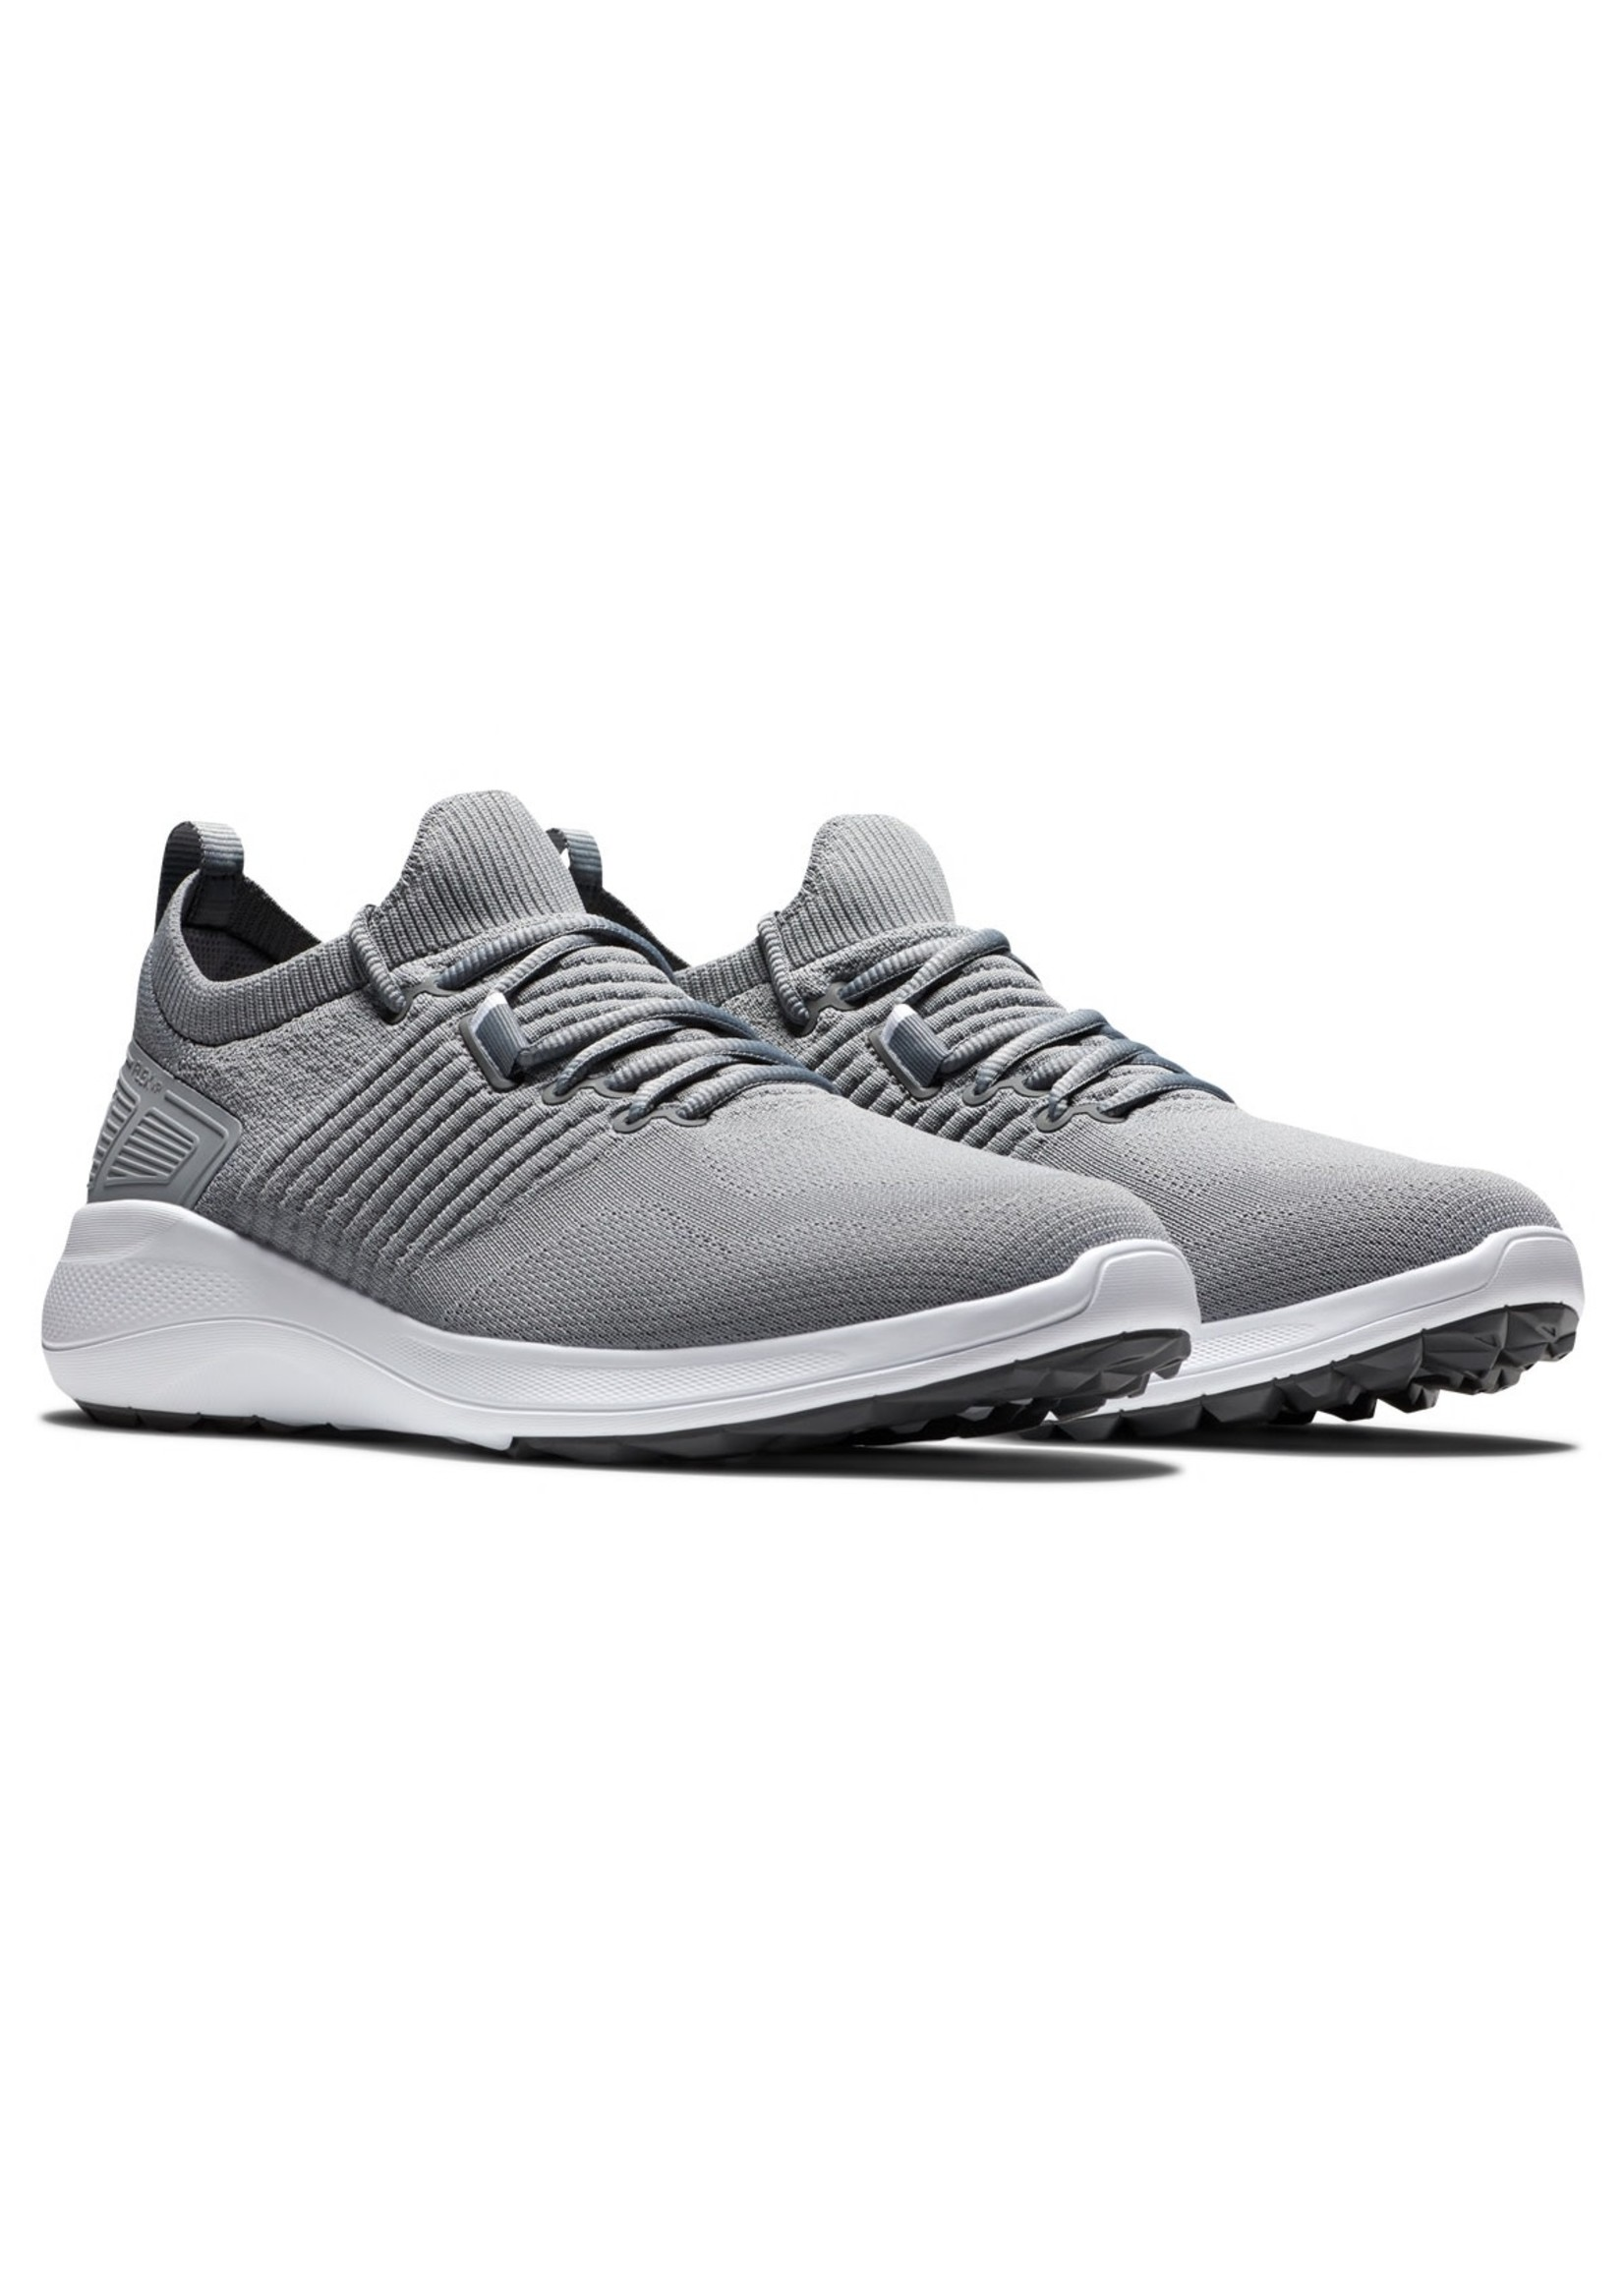 Footjoy Footjoy FJ Flex XP Mens Golf Shoe, Grey (2021)